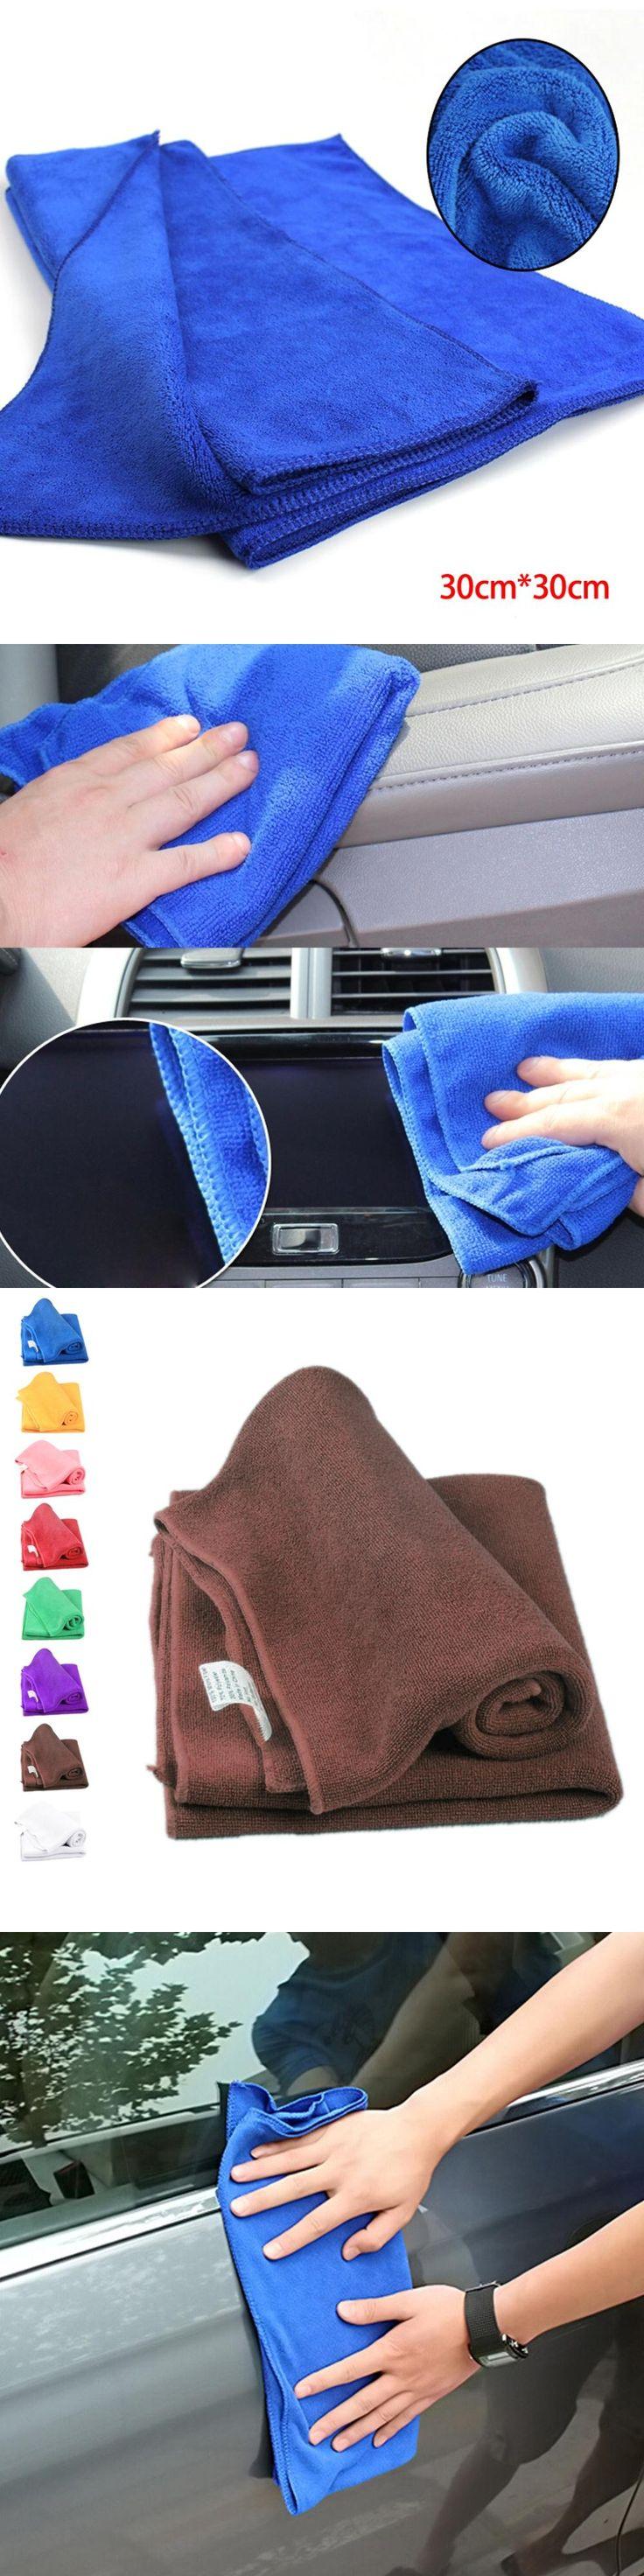 22*22cm Microfiber Face Hair Clean Car polishing Streak-Free Towel cloth